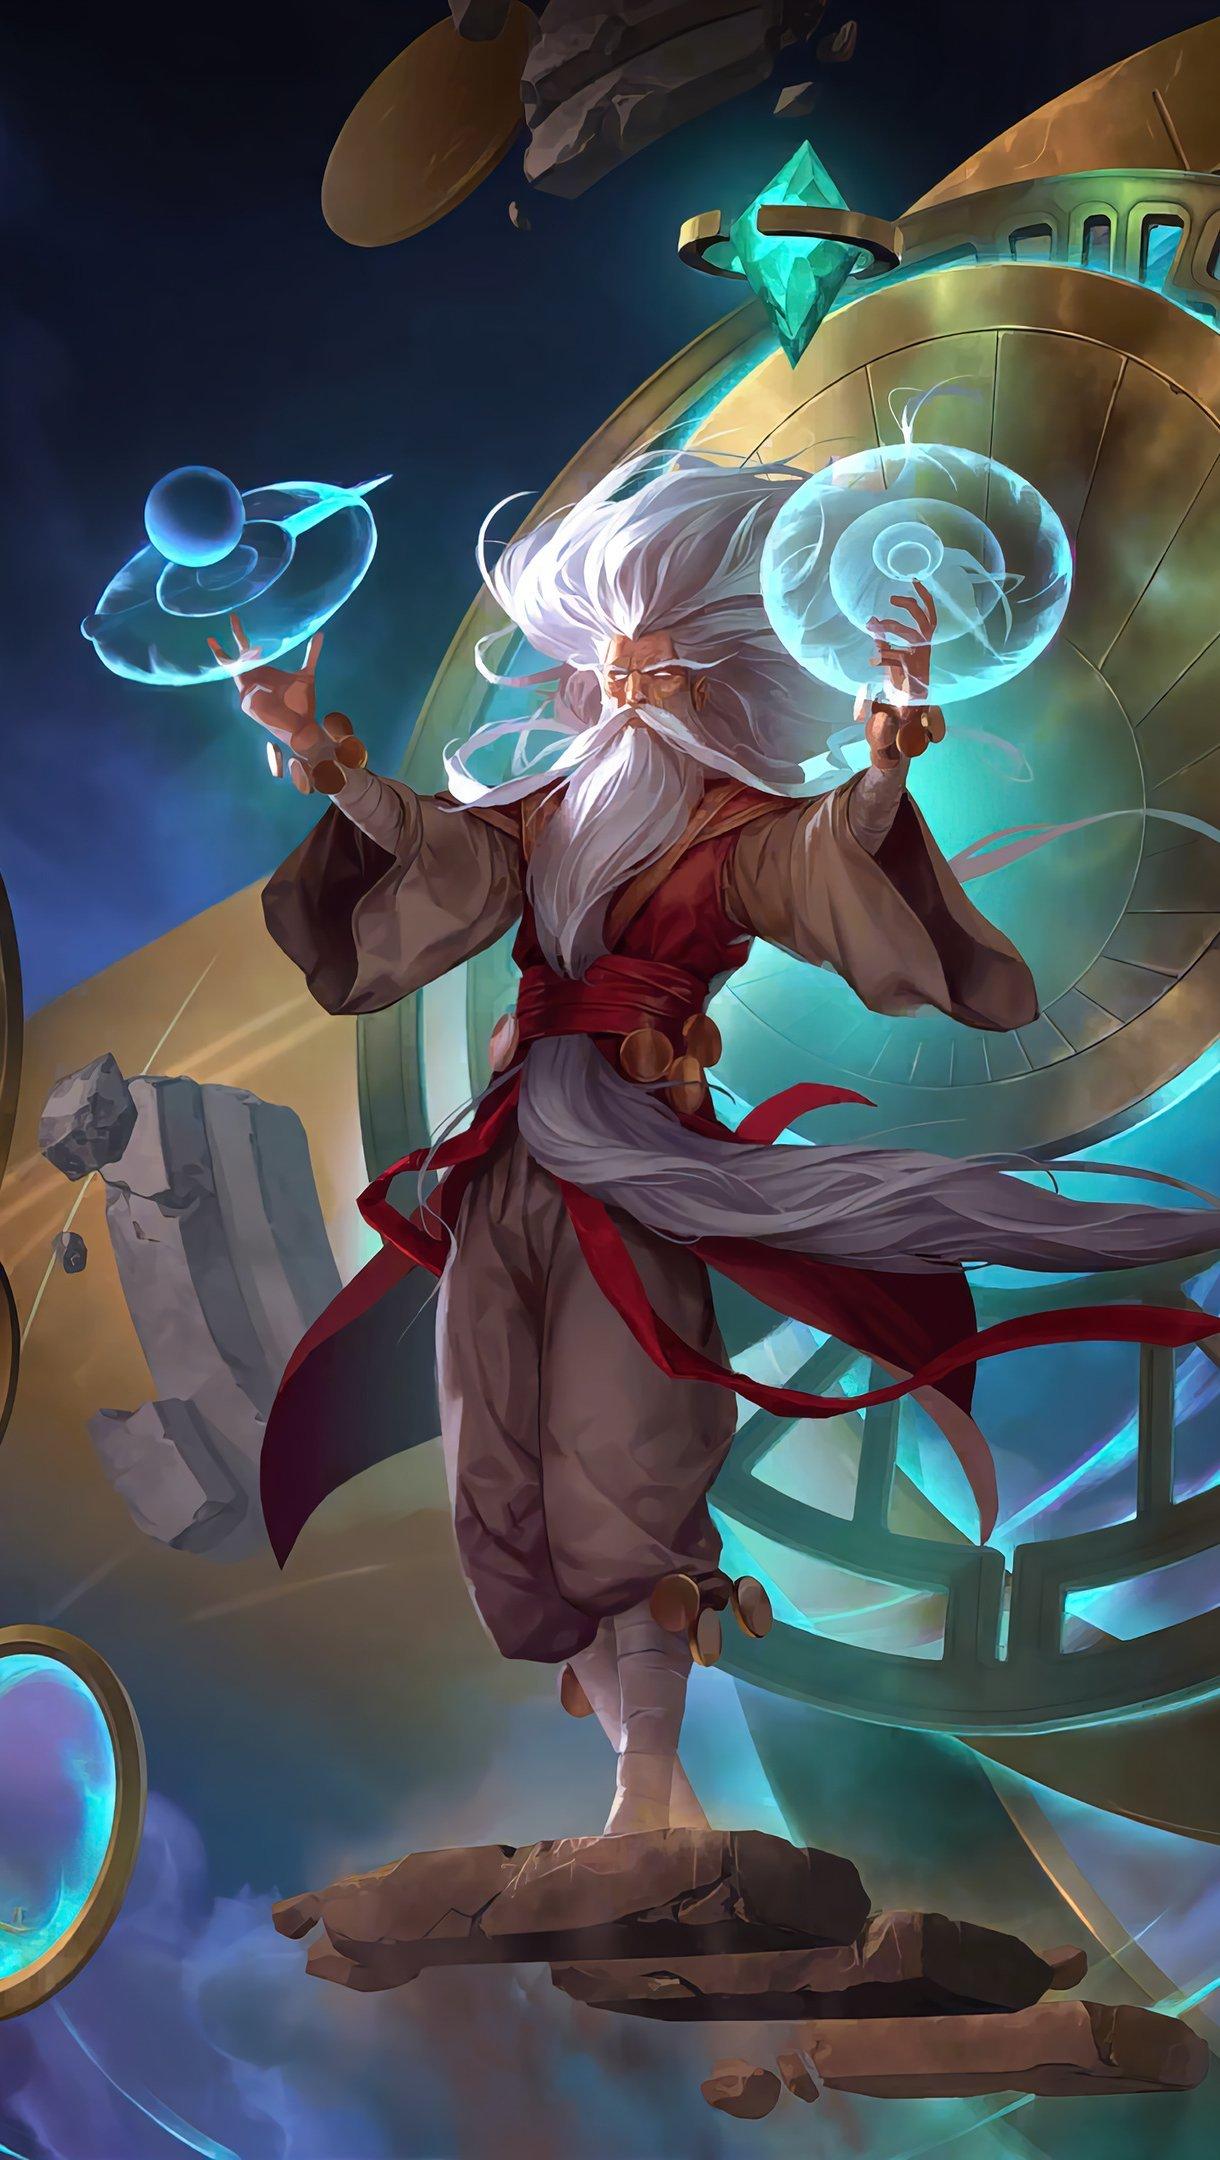 Fondos de pantalla Zilean League of Legends Vertical